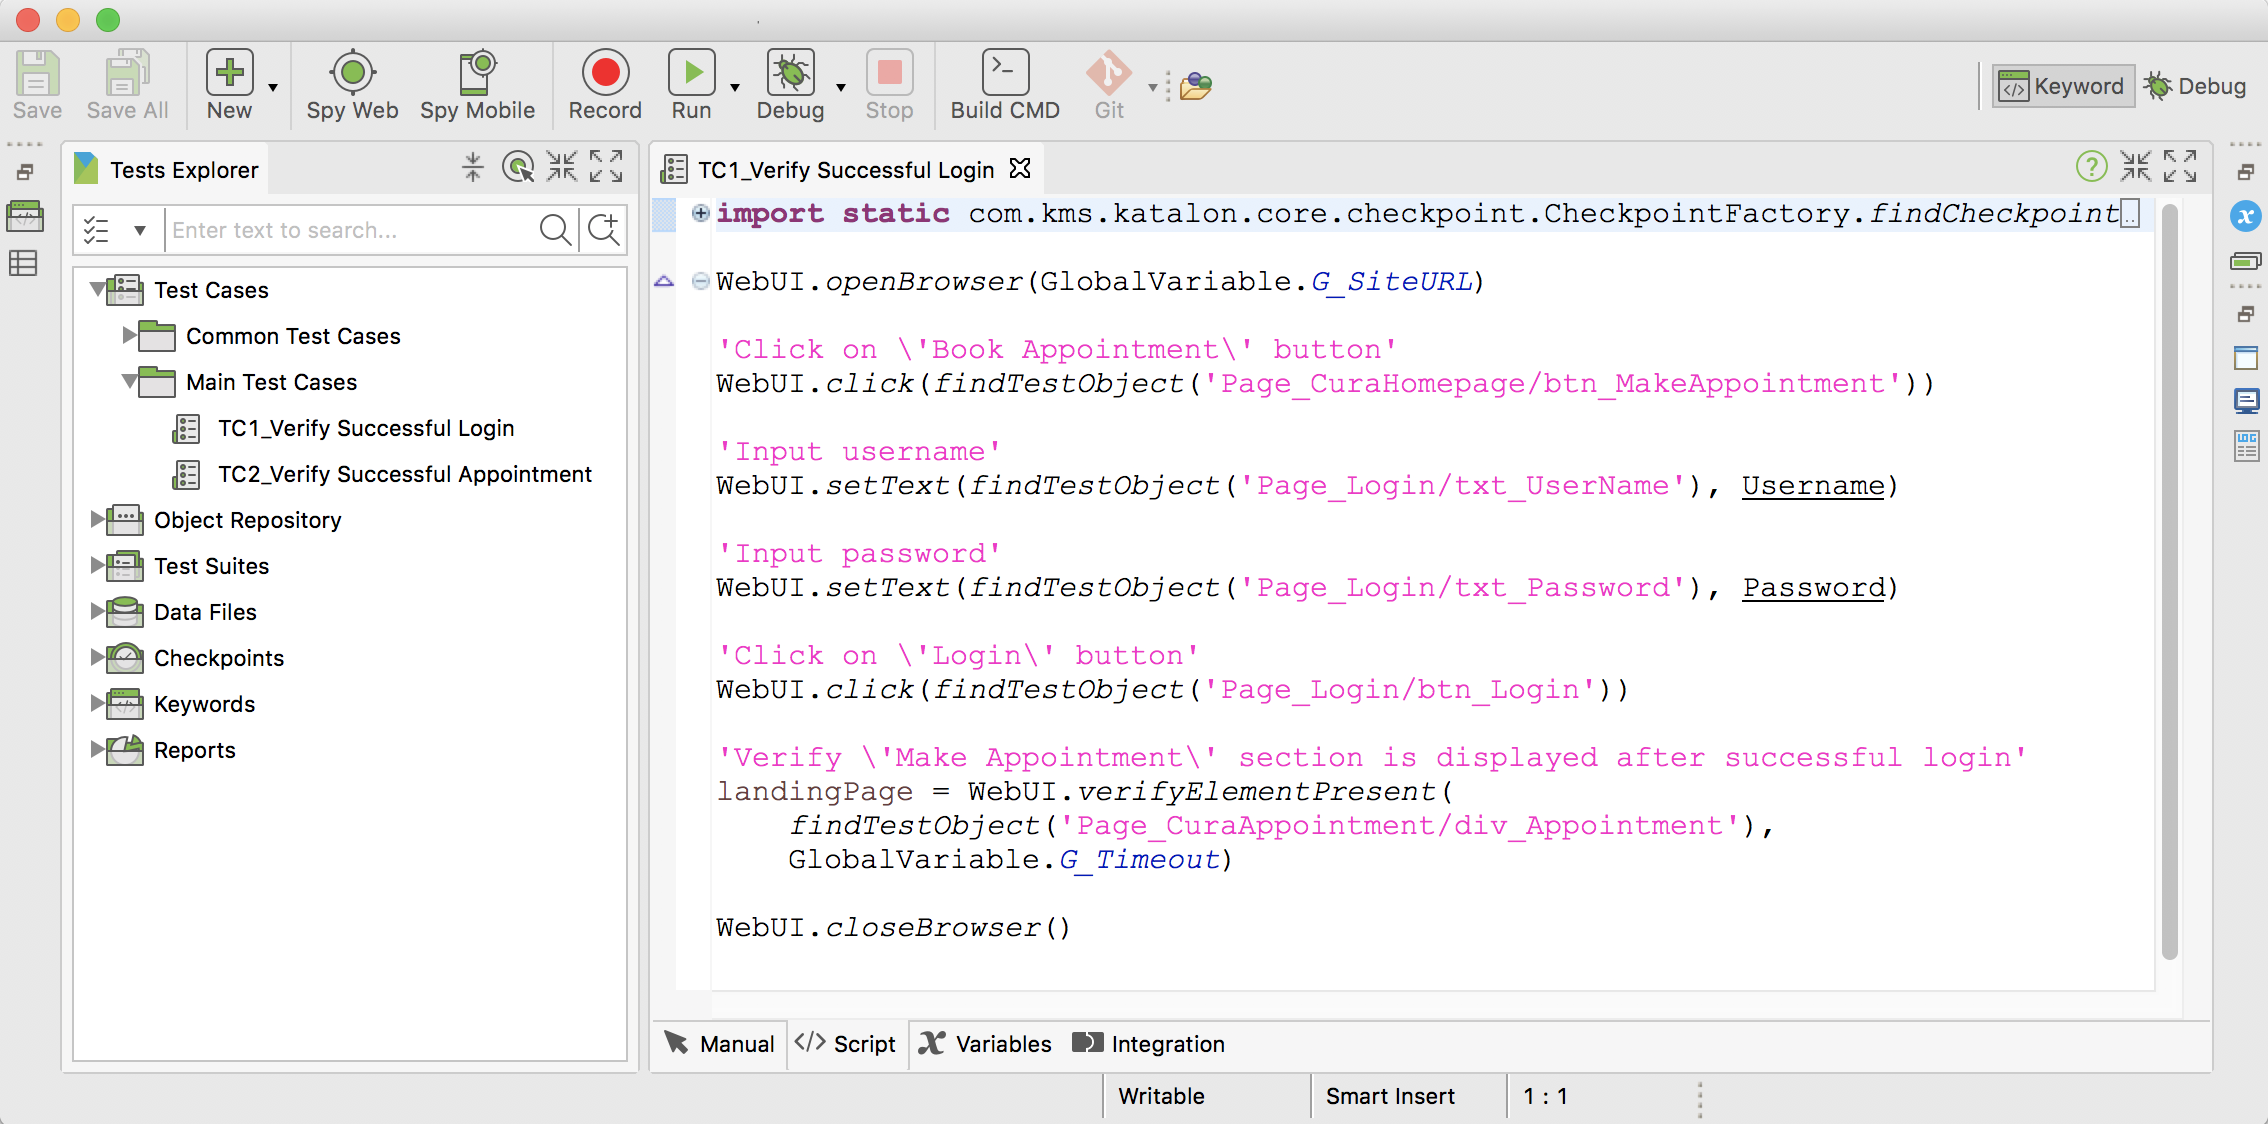 Katalon Studio Demo - Create+Tests.png